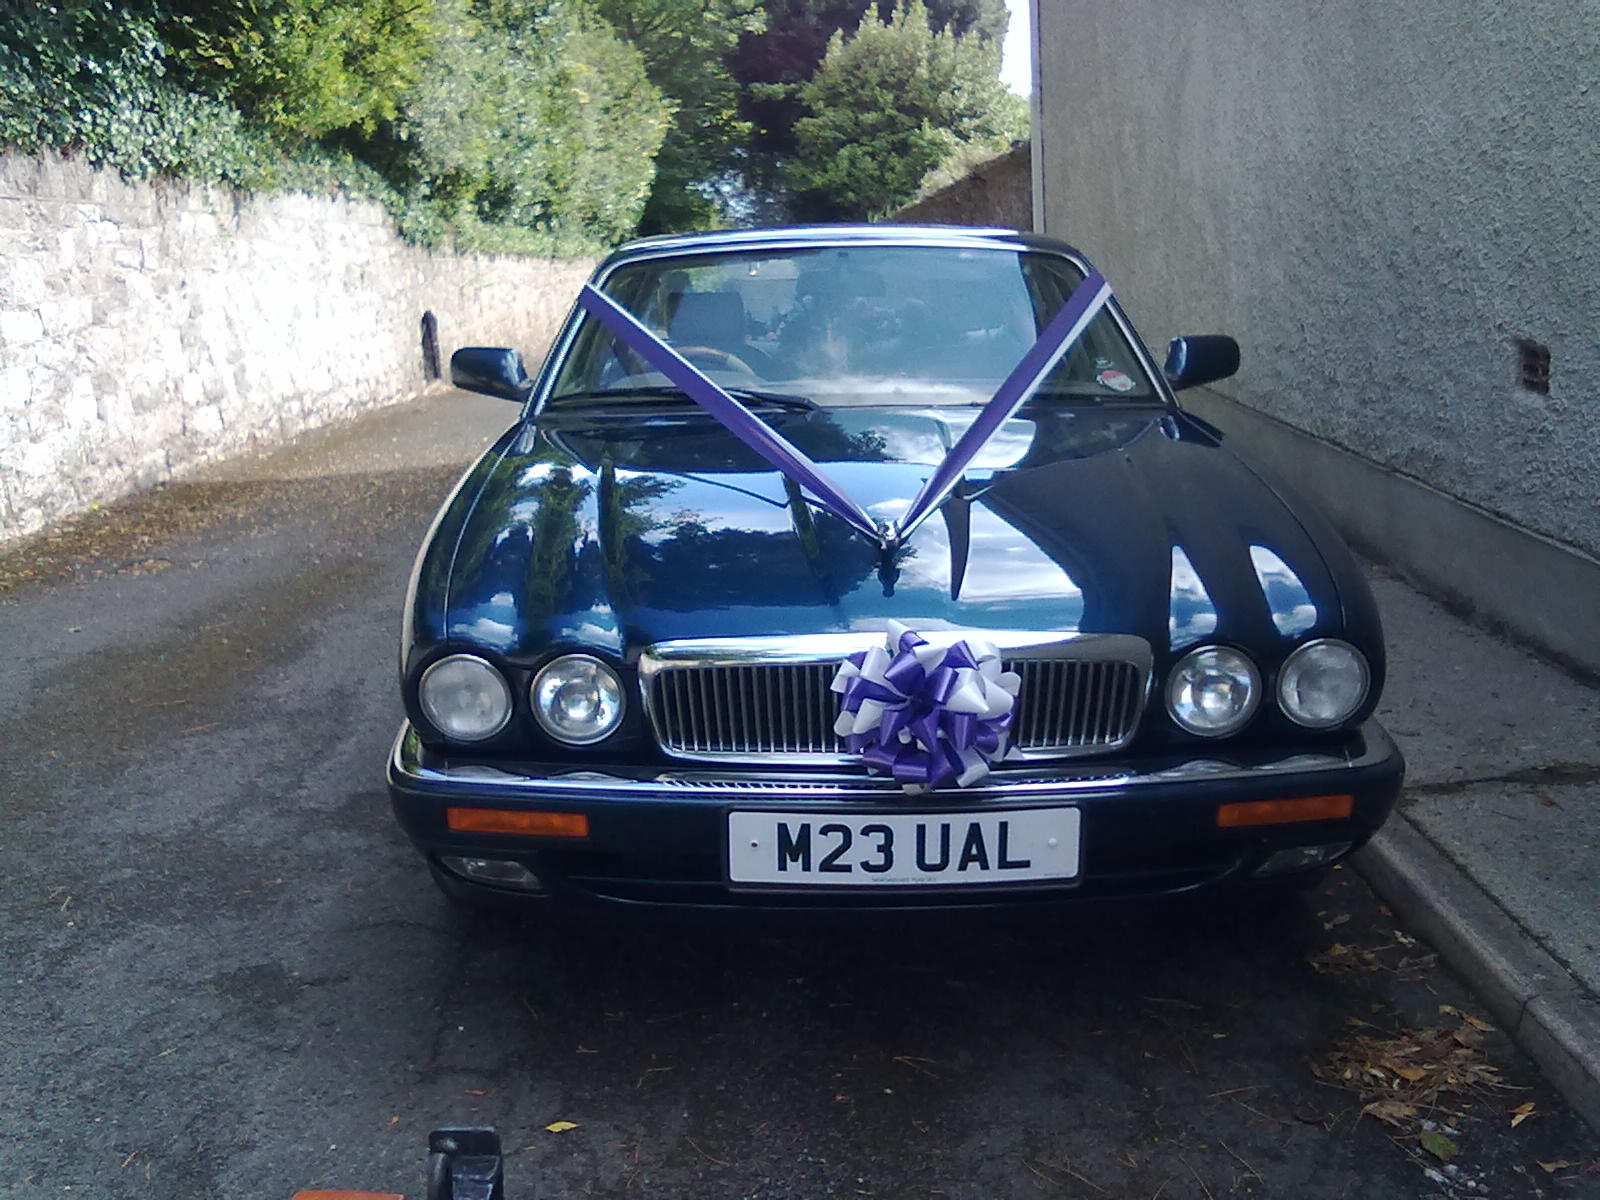 Hubby's beloved old Jag